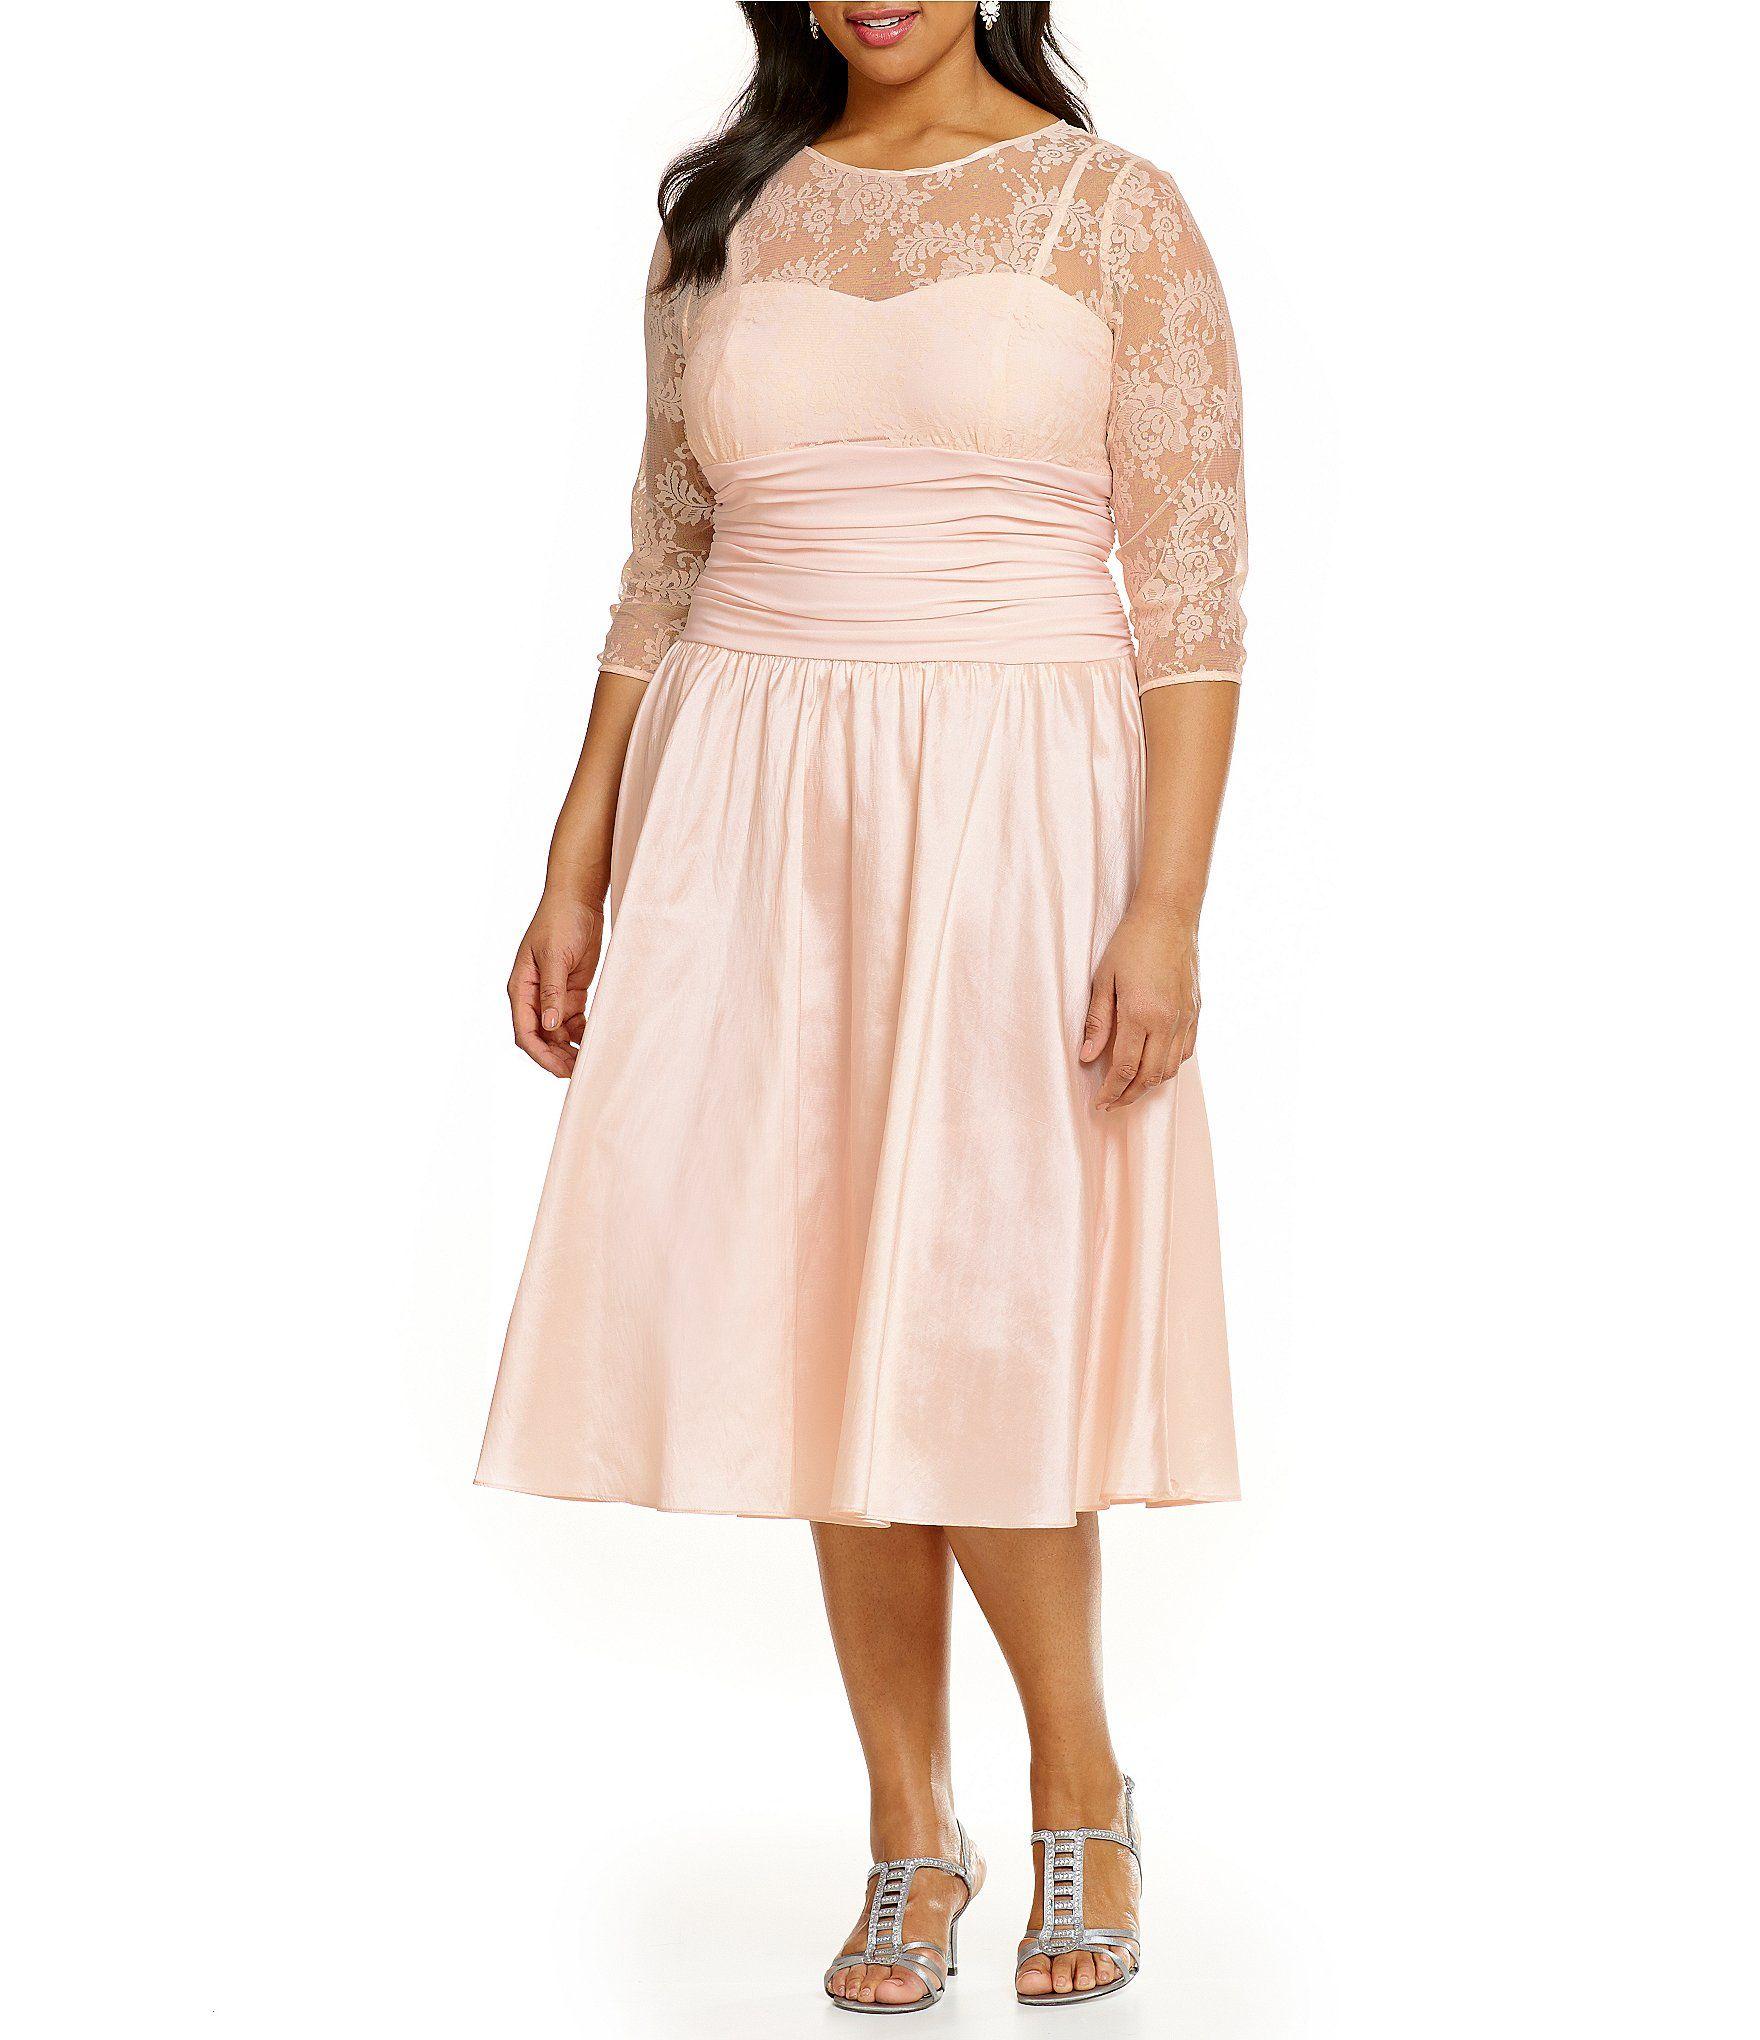 6cae62ae9f8 Shop for Jessica Howard Plus Illusion Taffeta Party Dress at Dillards.com.  Visit Dillards.com to find clothing